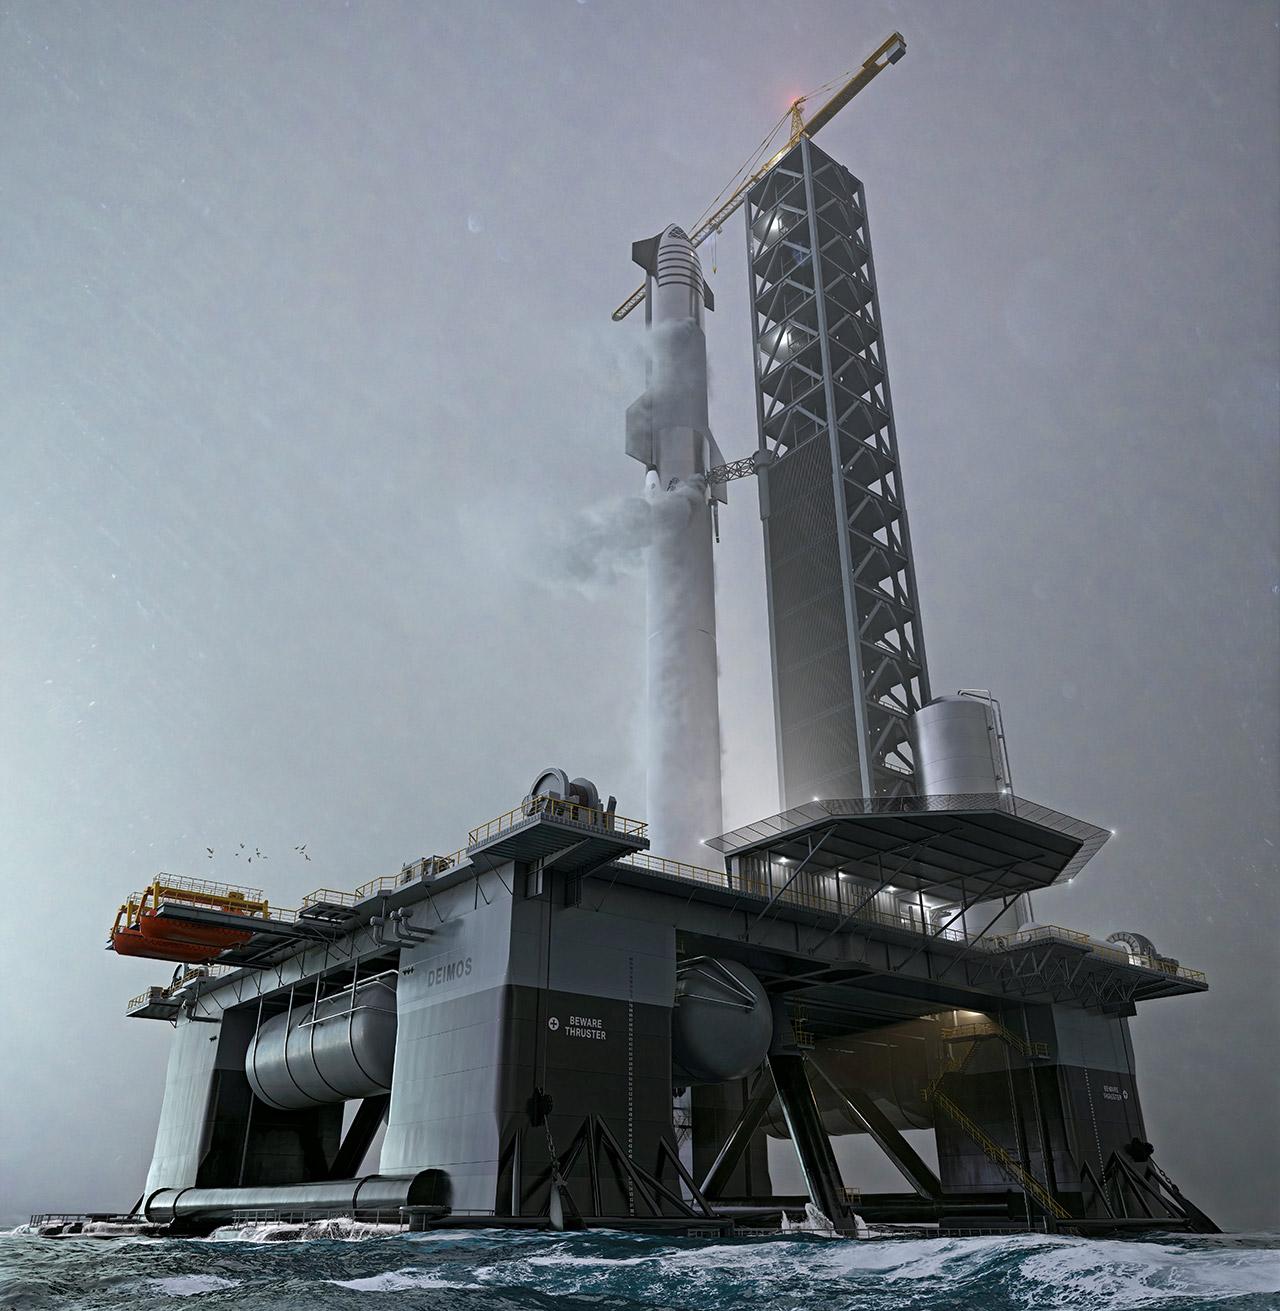 Elon Musk SpaceX Ocean Spacesport Deimos Starship Space Launch